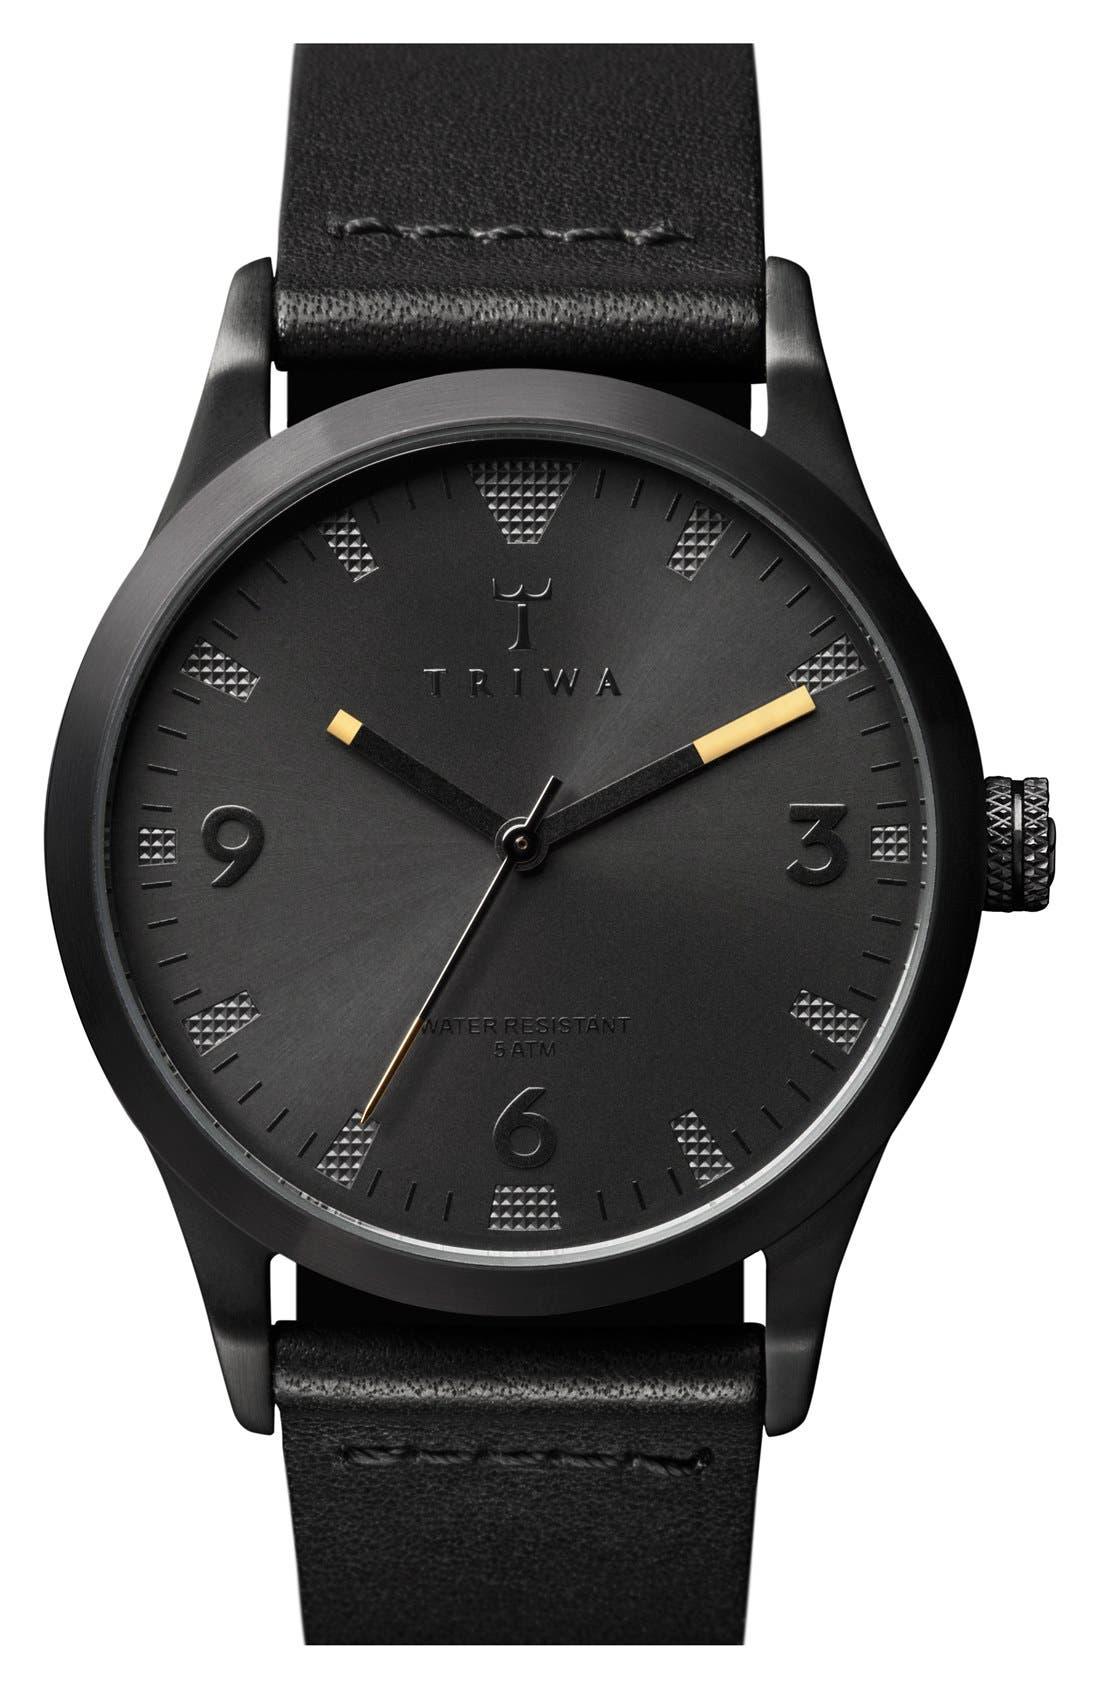 Triwa 'Sort of Black' Leather Strap Watch, 38mm